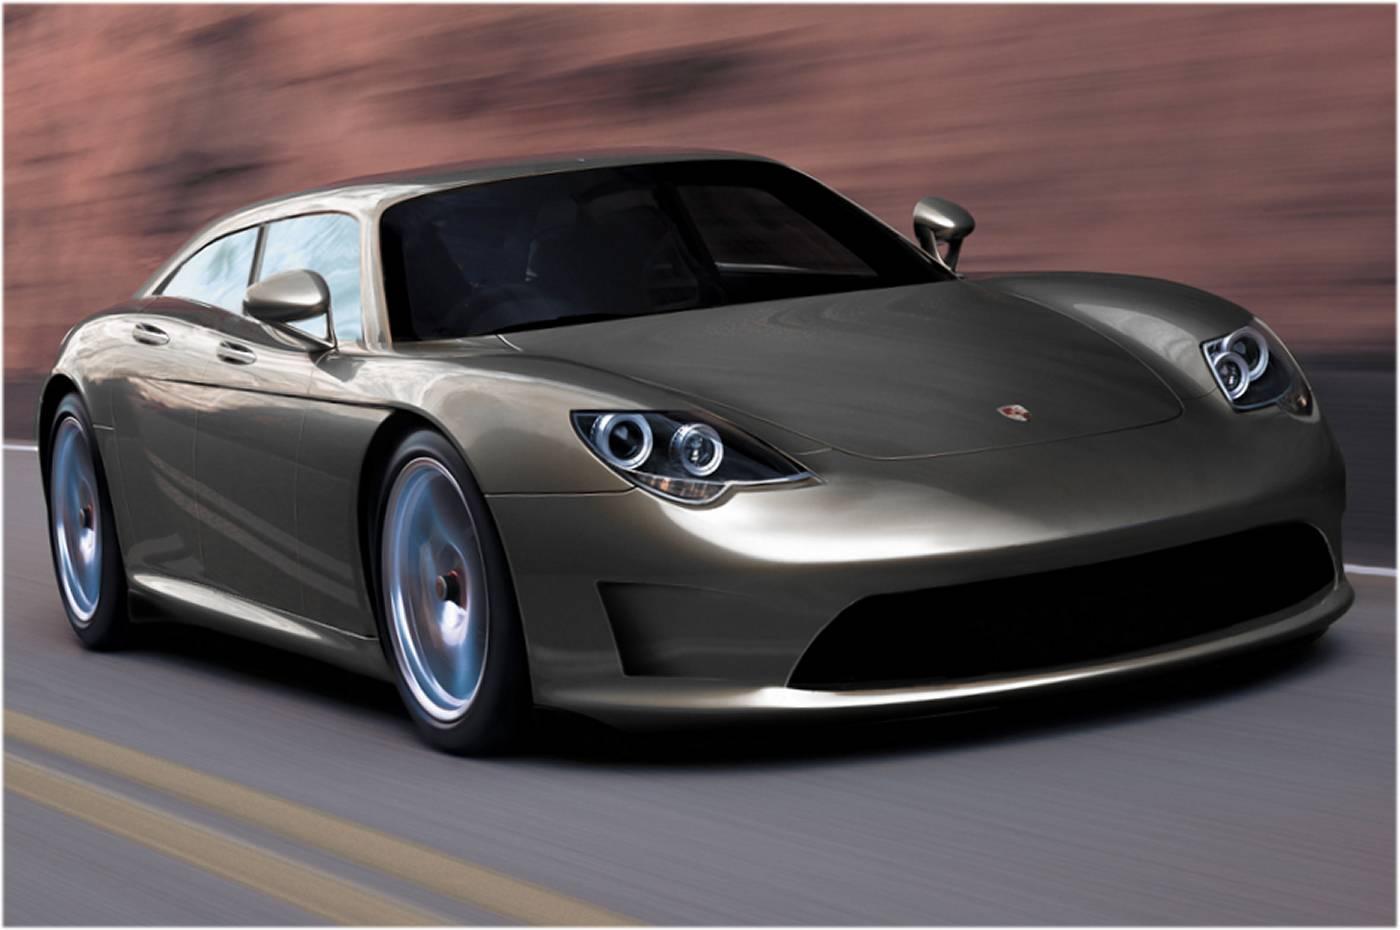 Car Shows And Auto News Online Porsche Reveals New